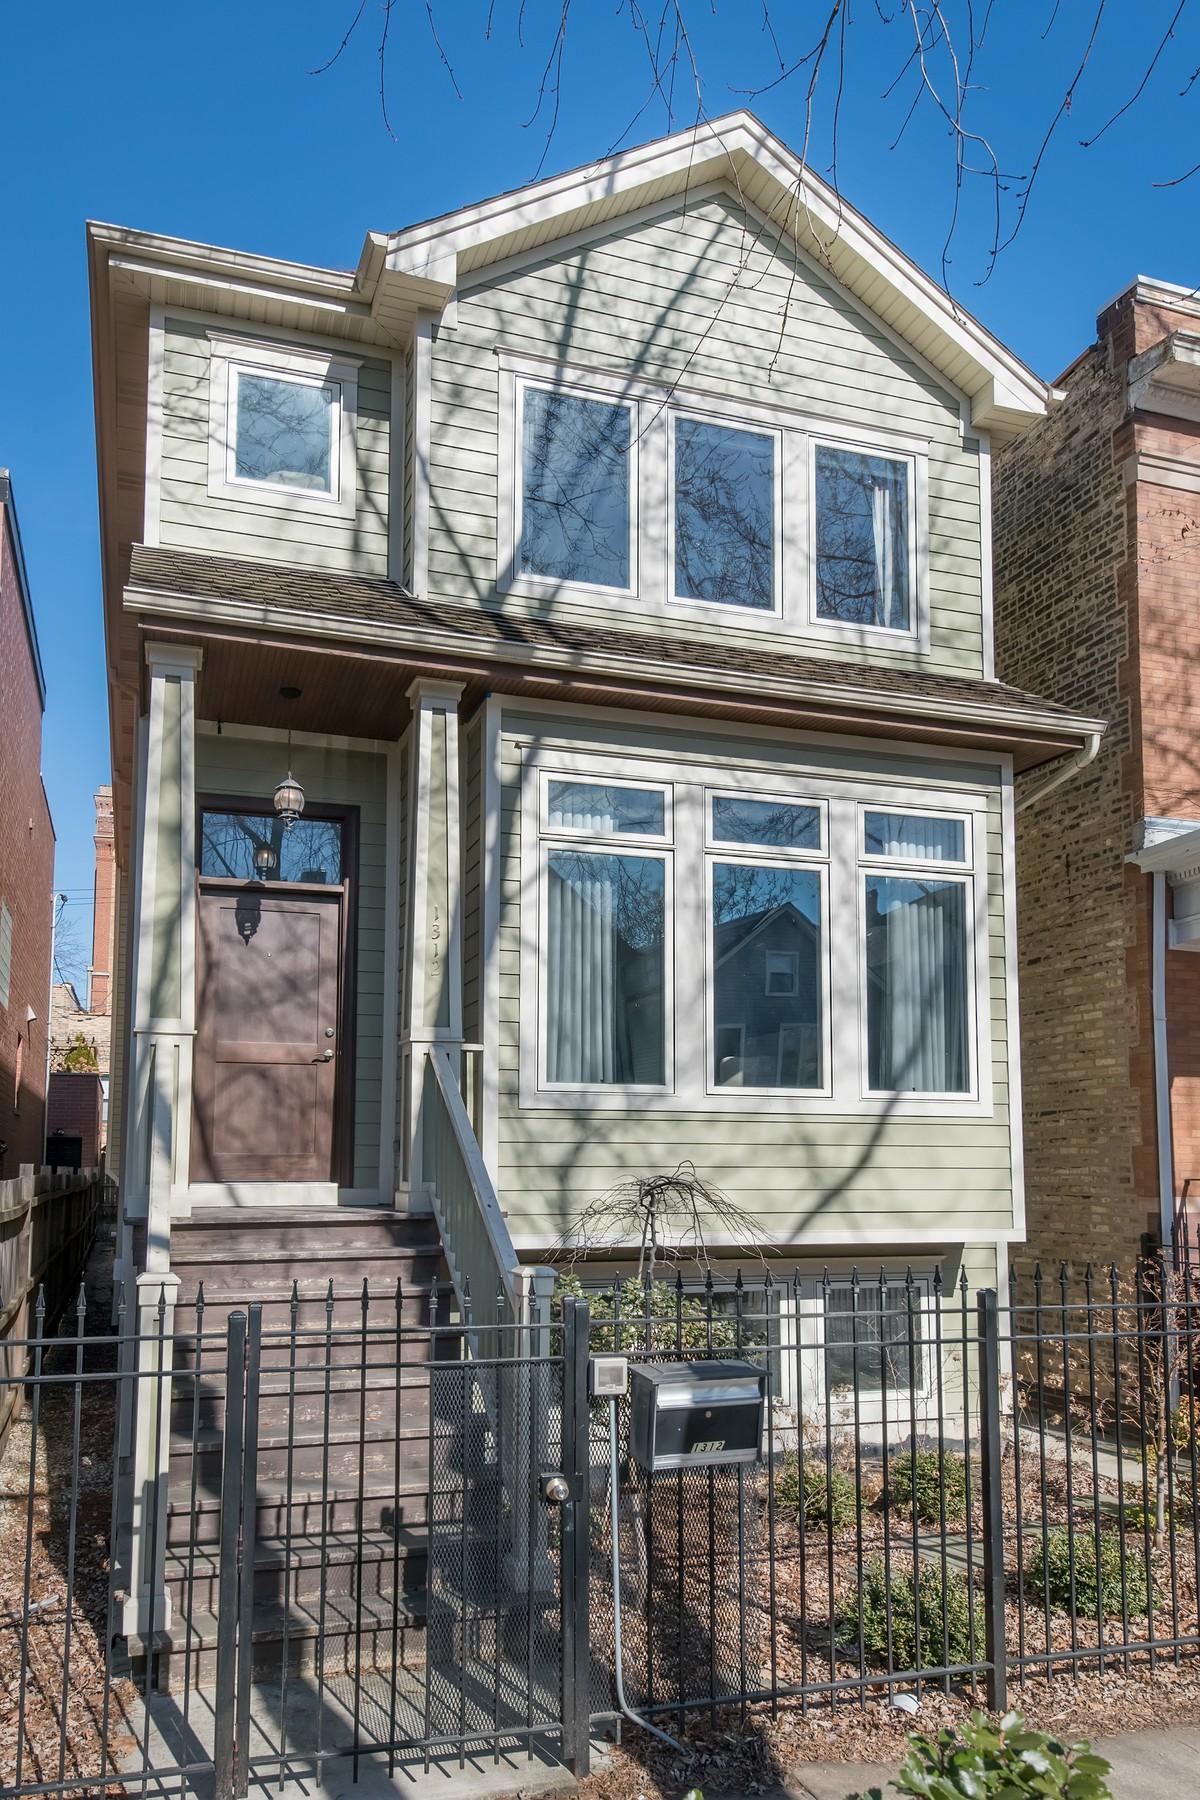 Nhà ở một gia đình vì Bán tại Perfect Lakeview Home In Burley School District! 1312 W Barry Avenue Lakeview, Chicago, Illinois, 60657 Hoa Kỳ